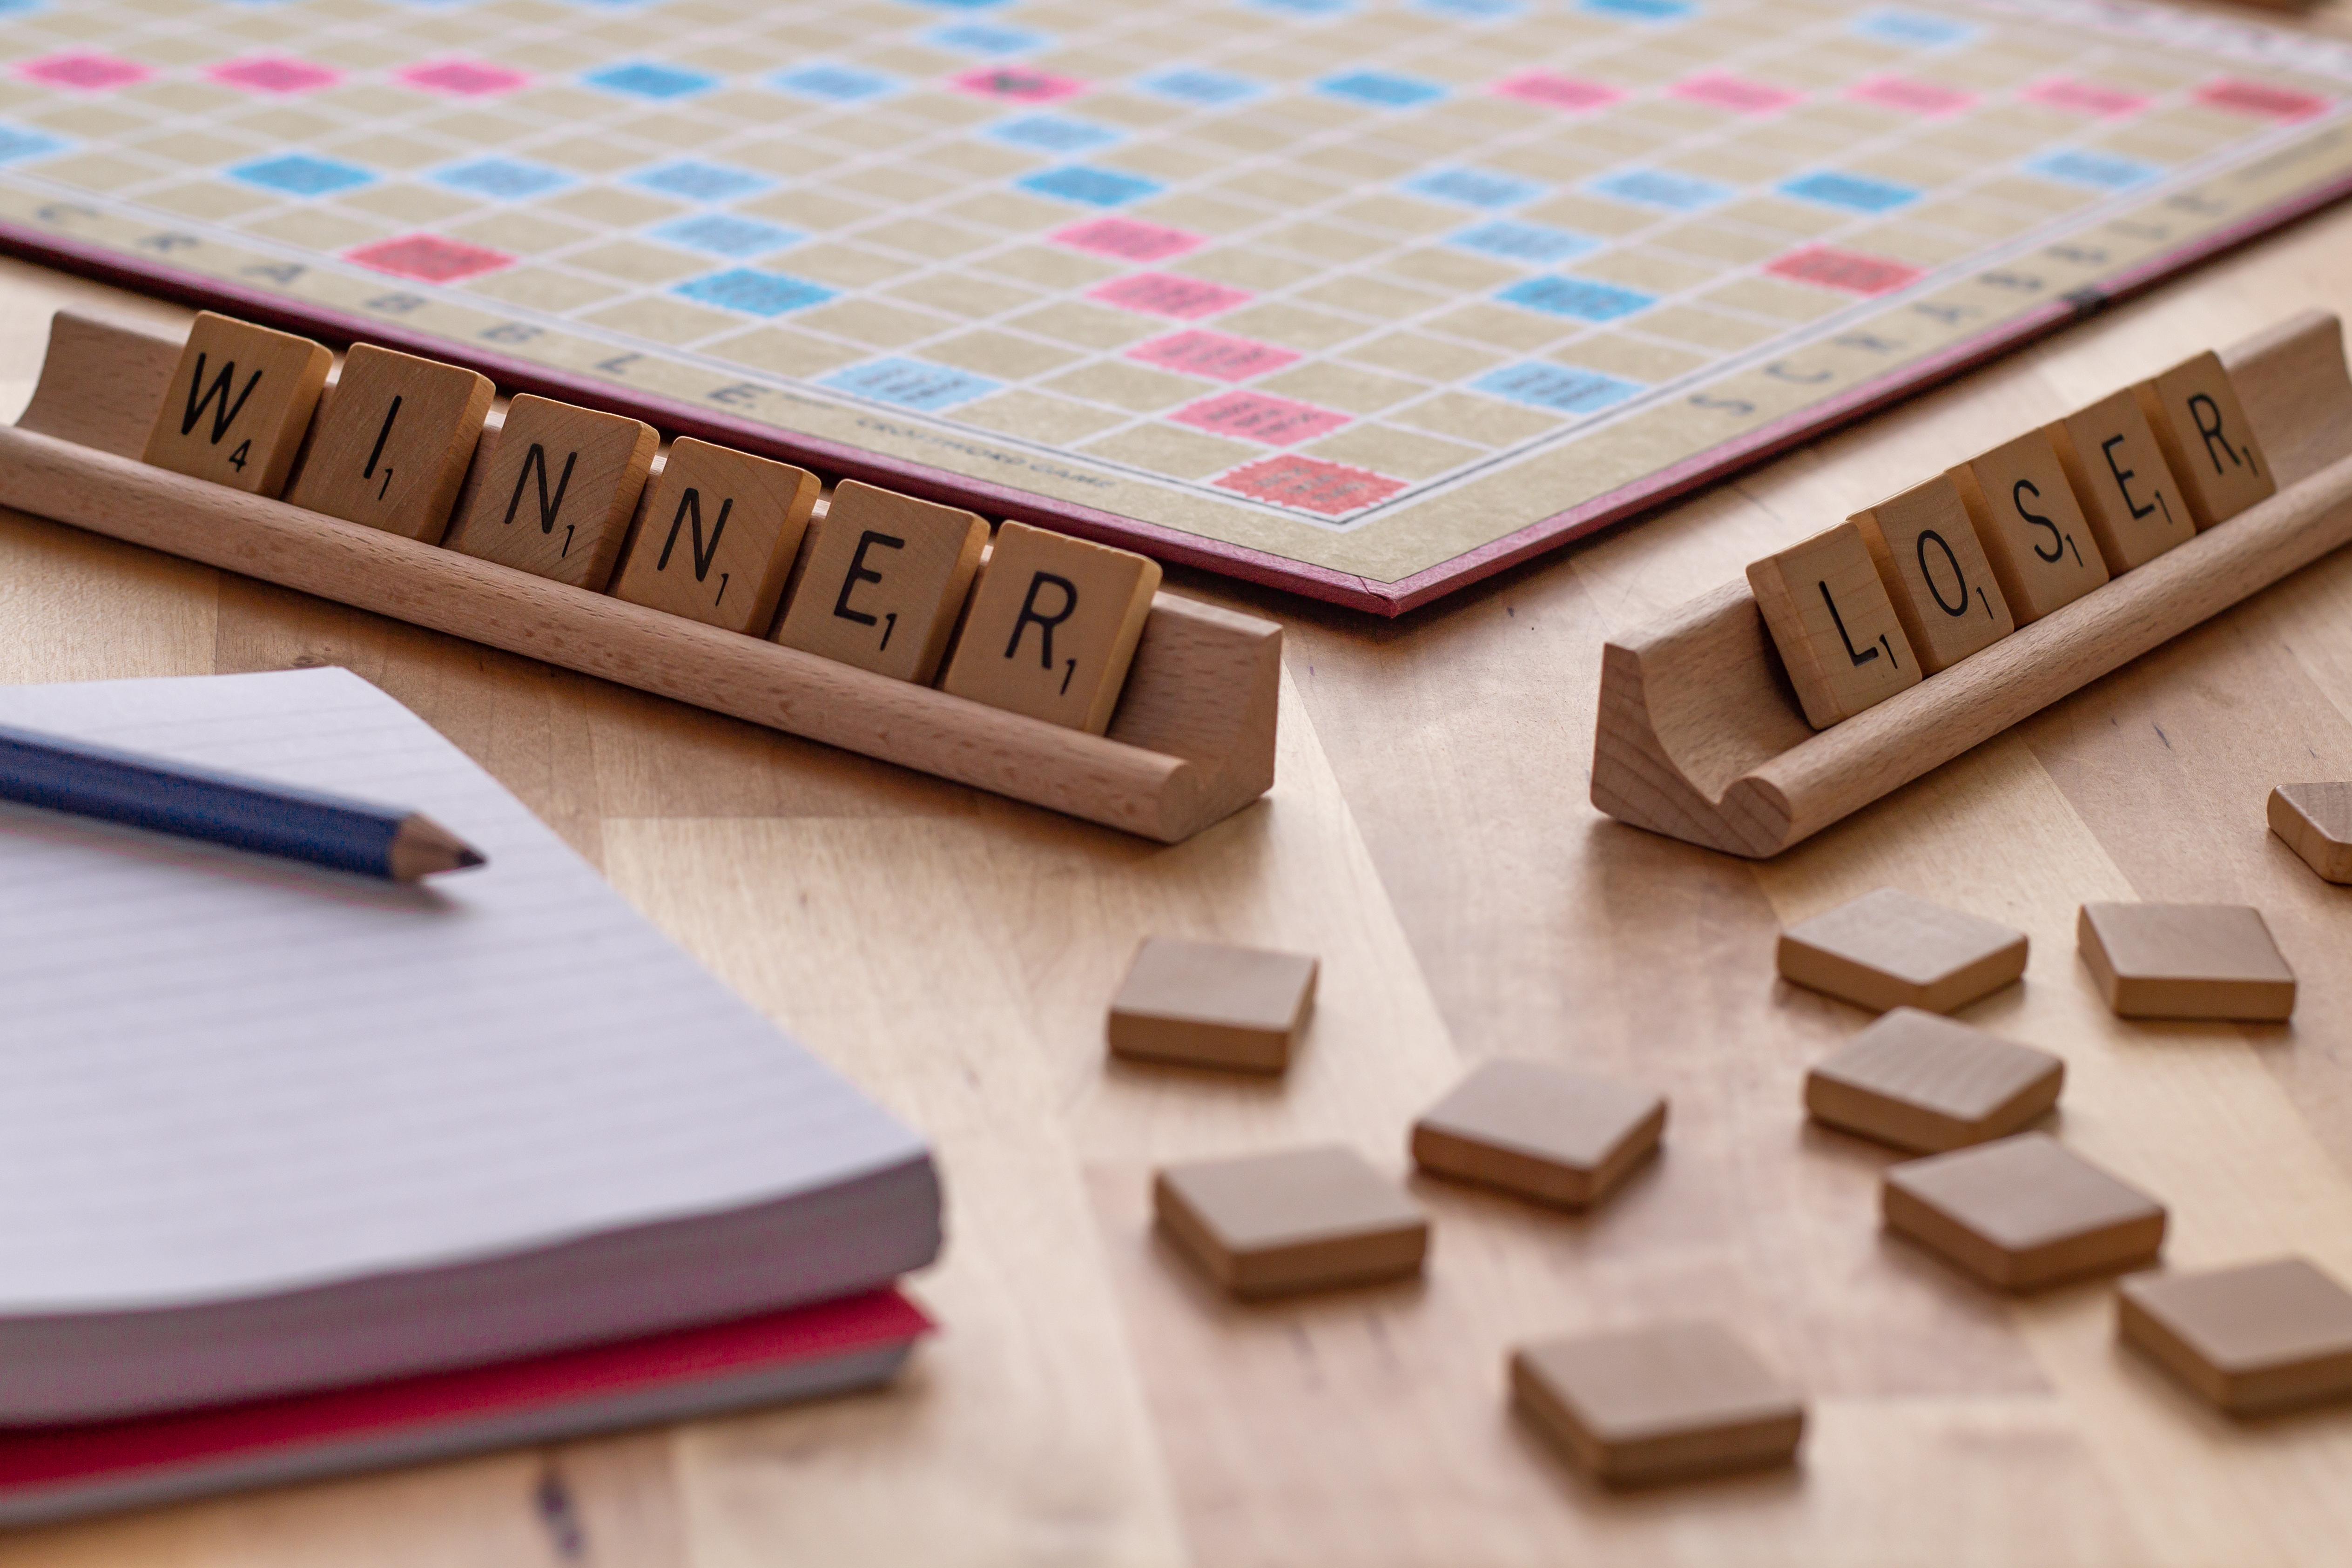 shutterstock_winner loser.jpg